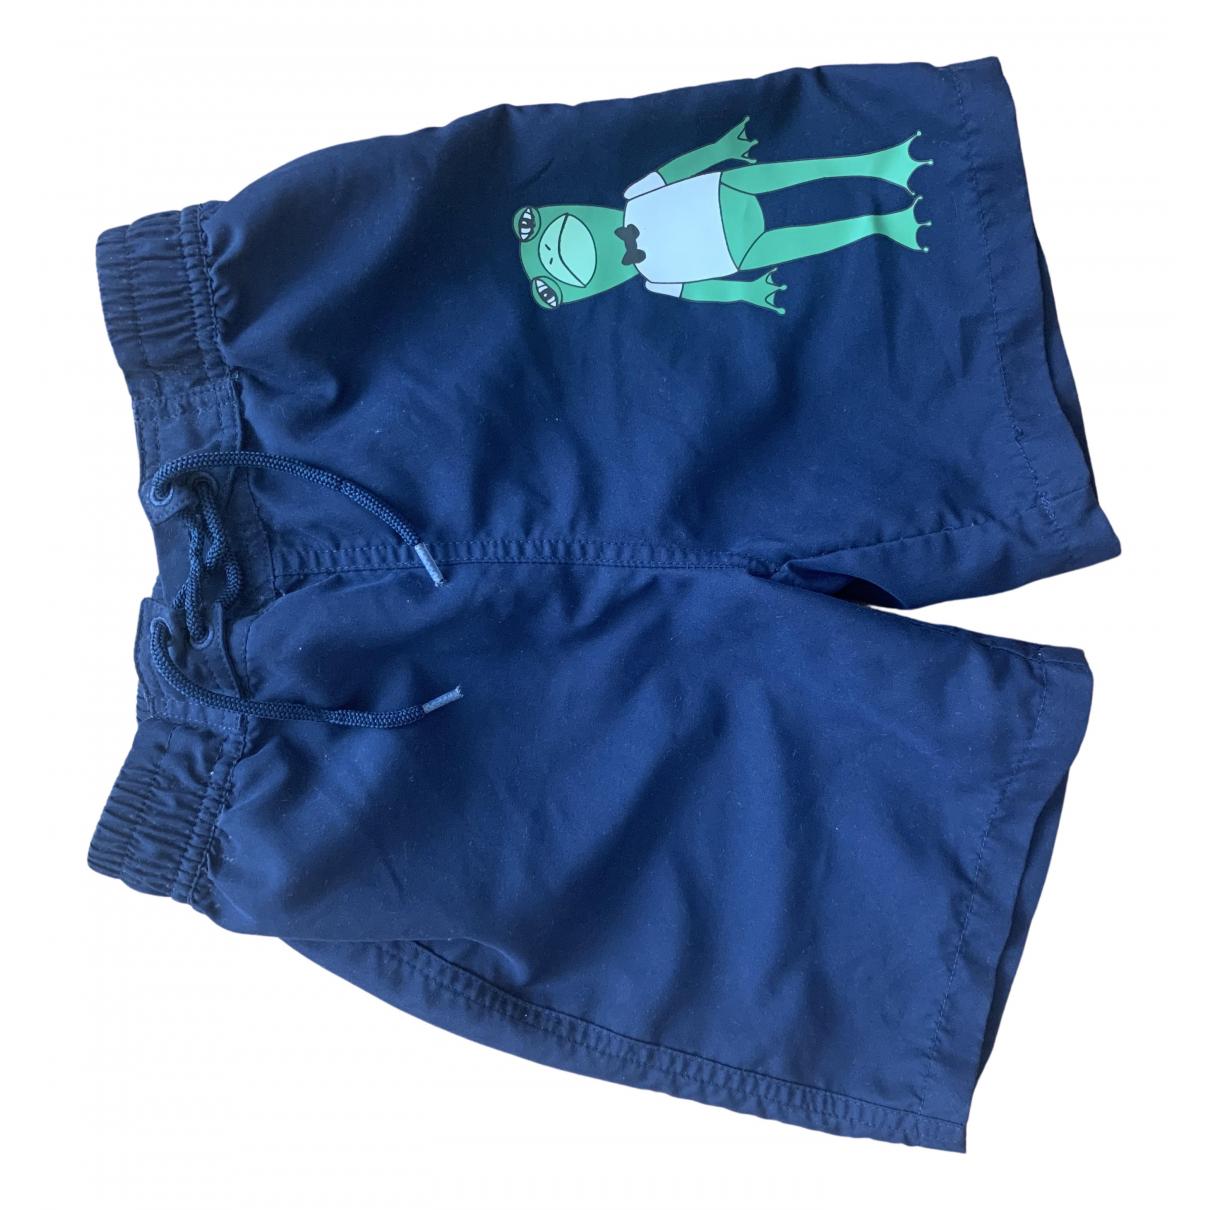 Pantalones en Poliester Azul Mini Rodini